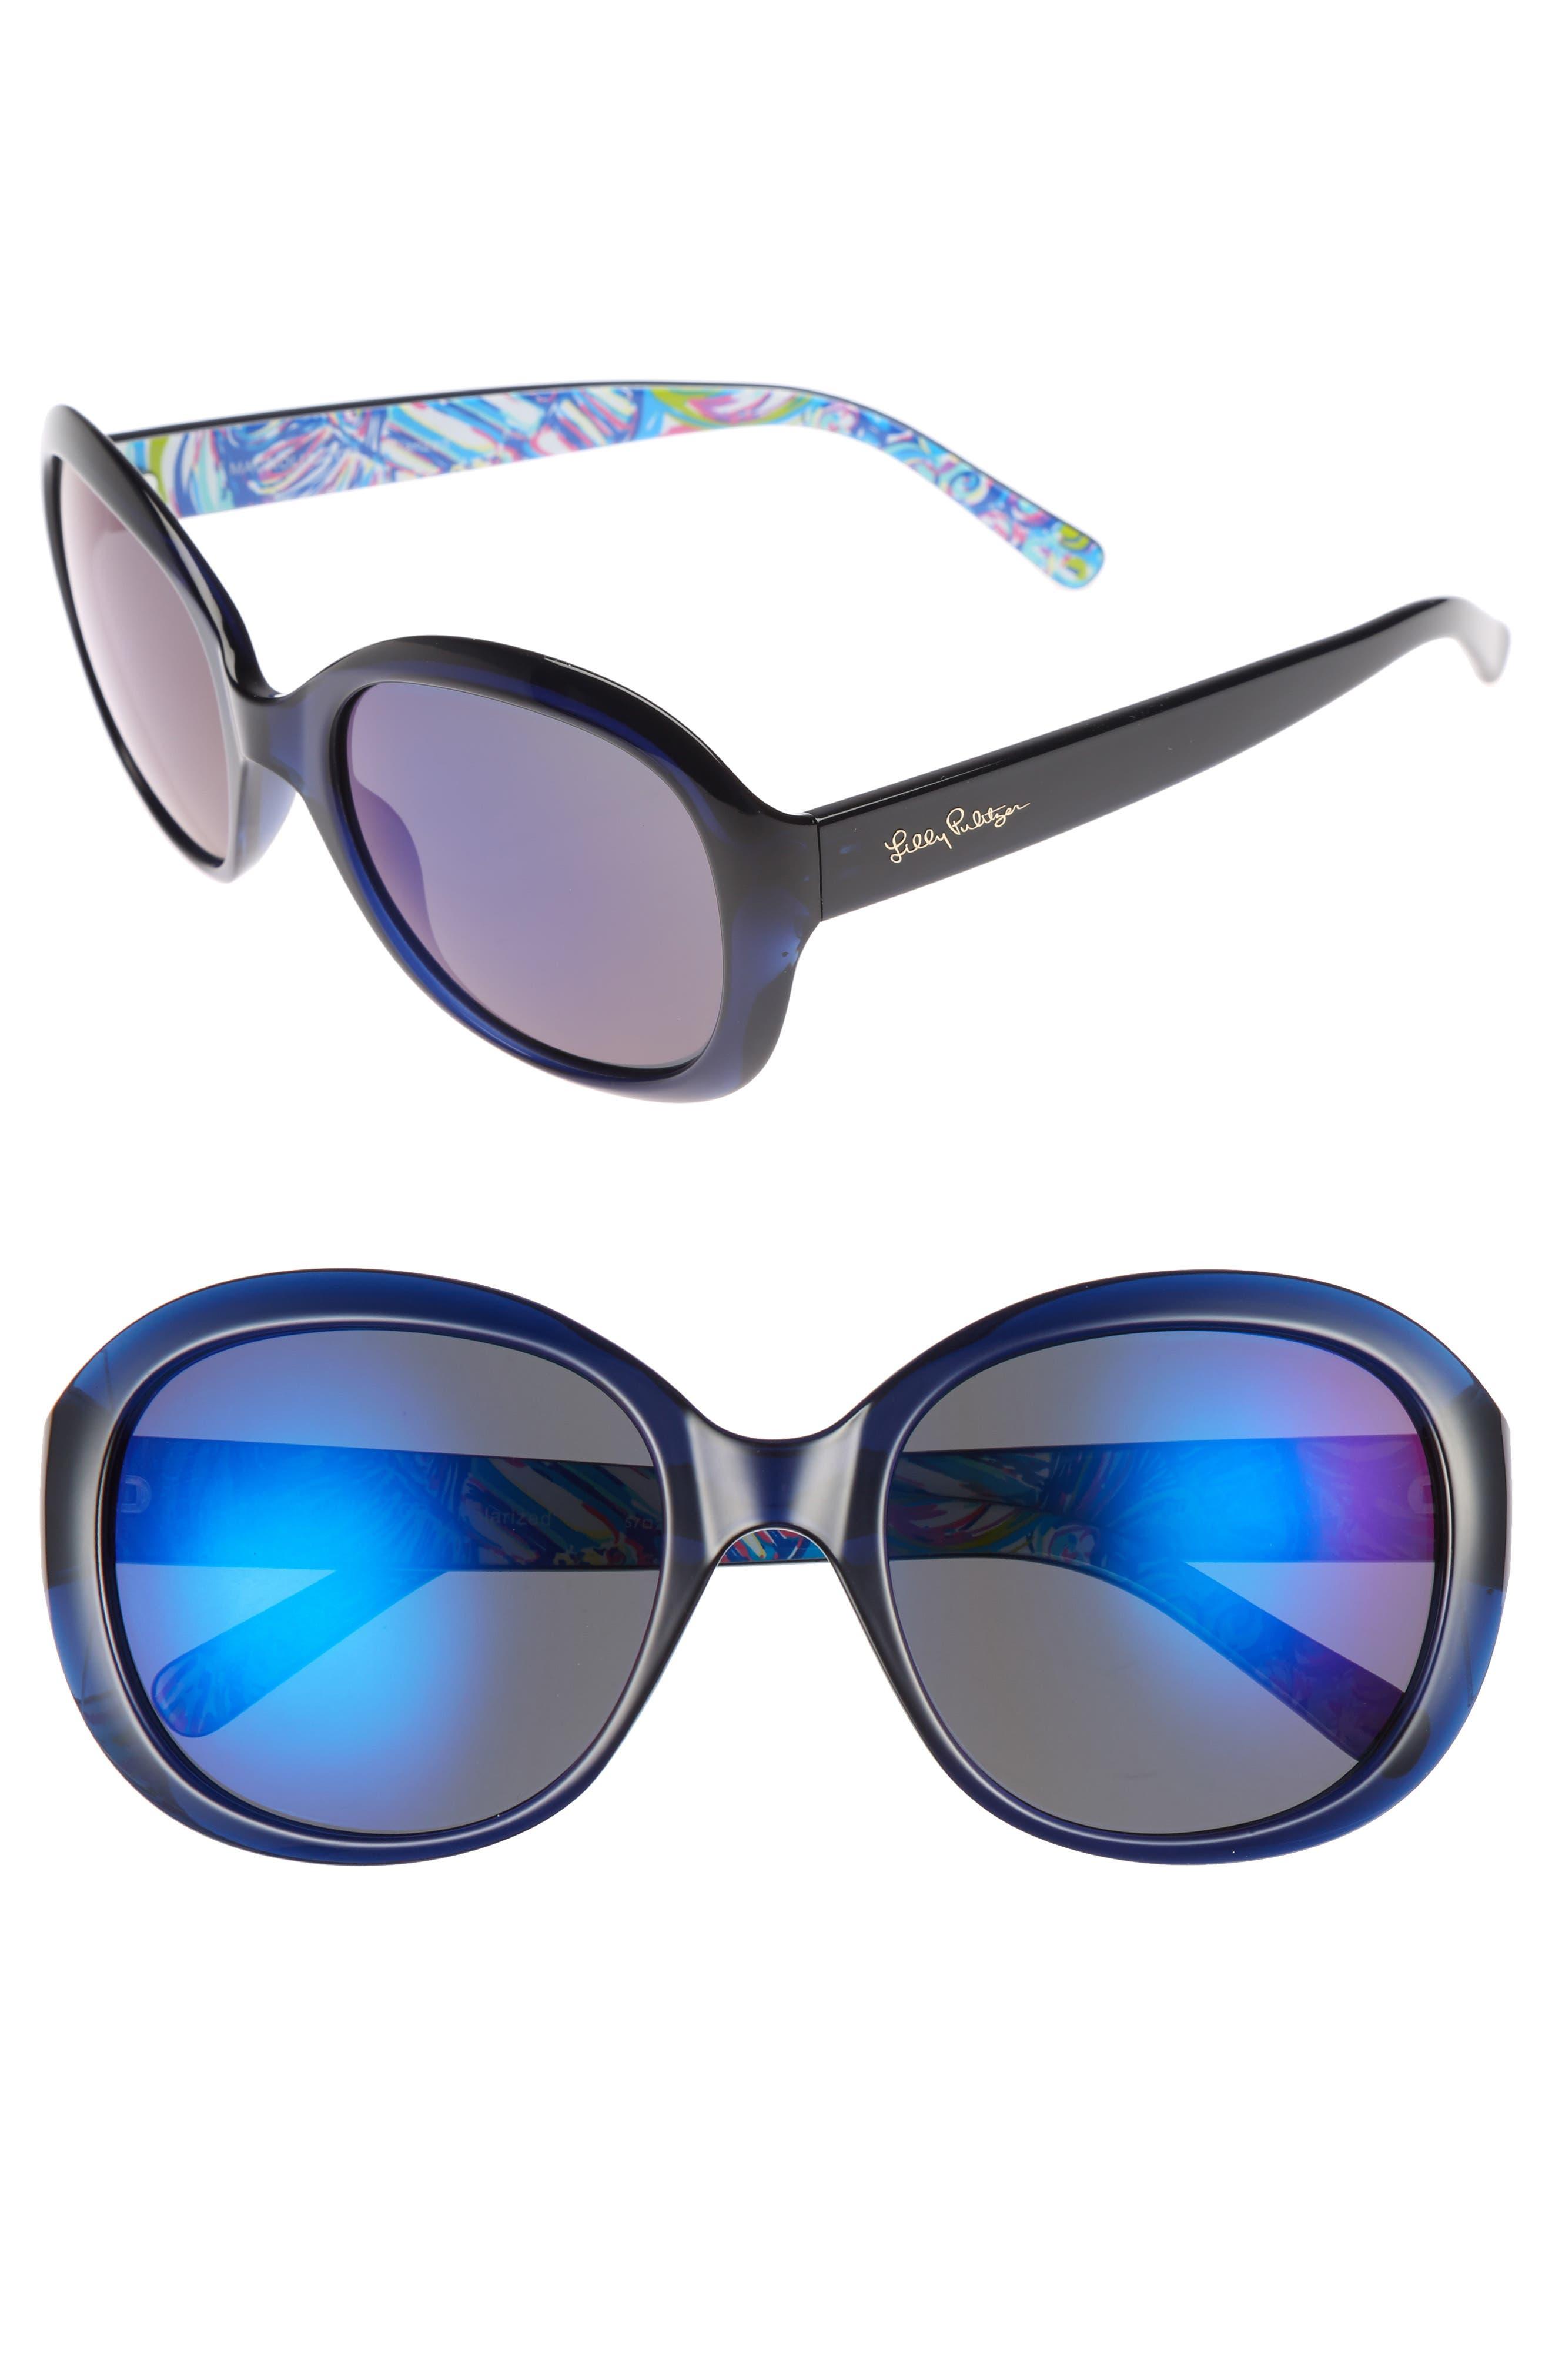 Alternate Image 1 Selected - Lilly Pulitzer® Magnolia 57mm Polarized Round Sunglasses